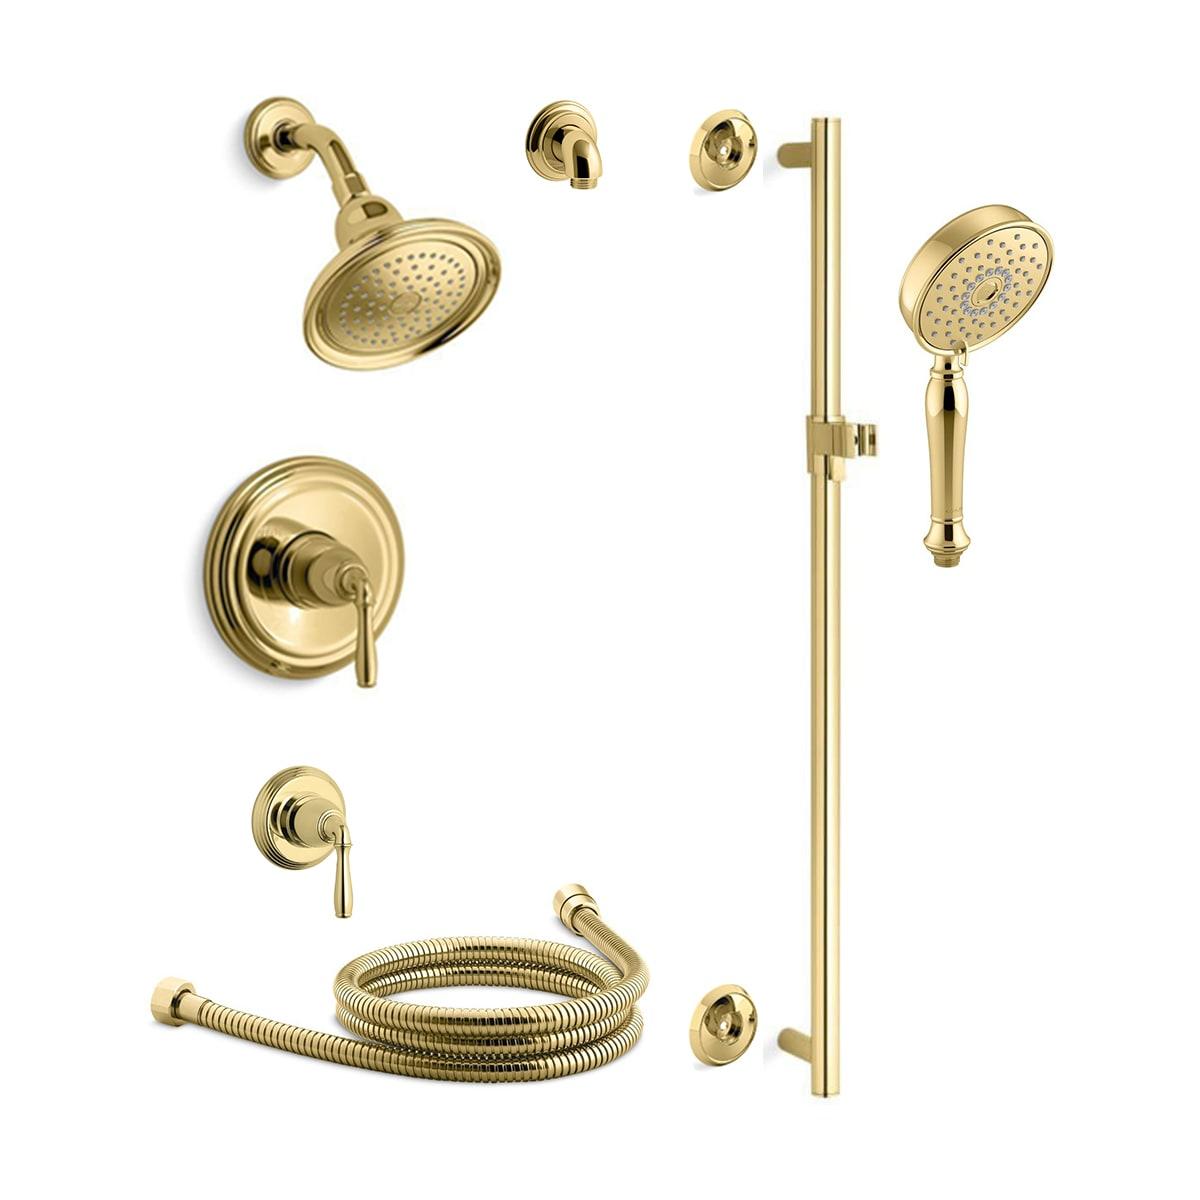 Kohler Kss Devonshire 4 Rths Pb Vibrant Polished Brass